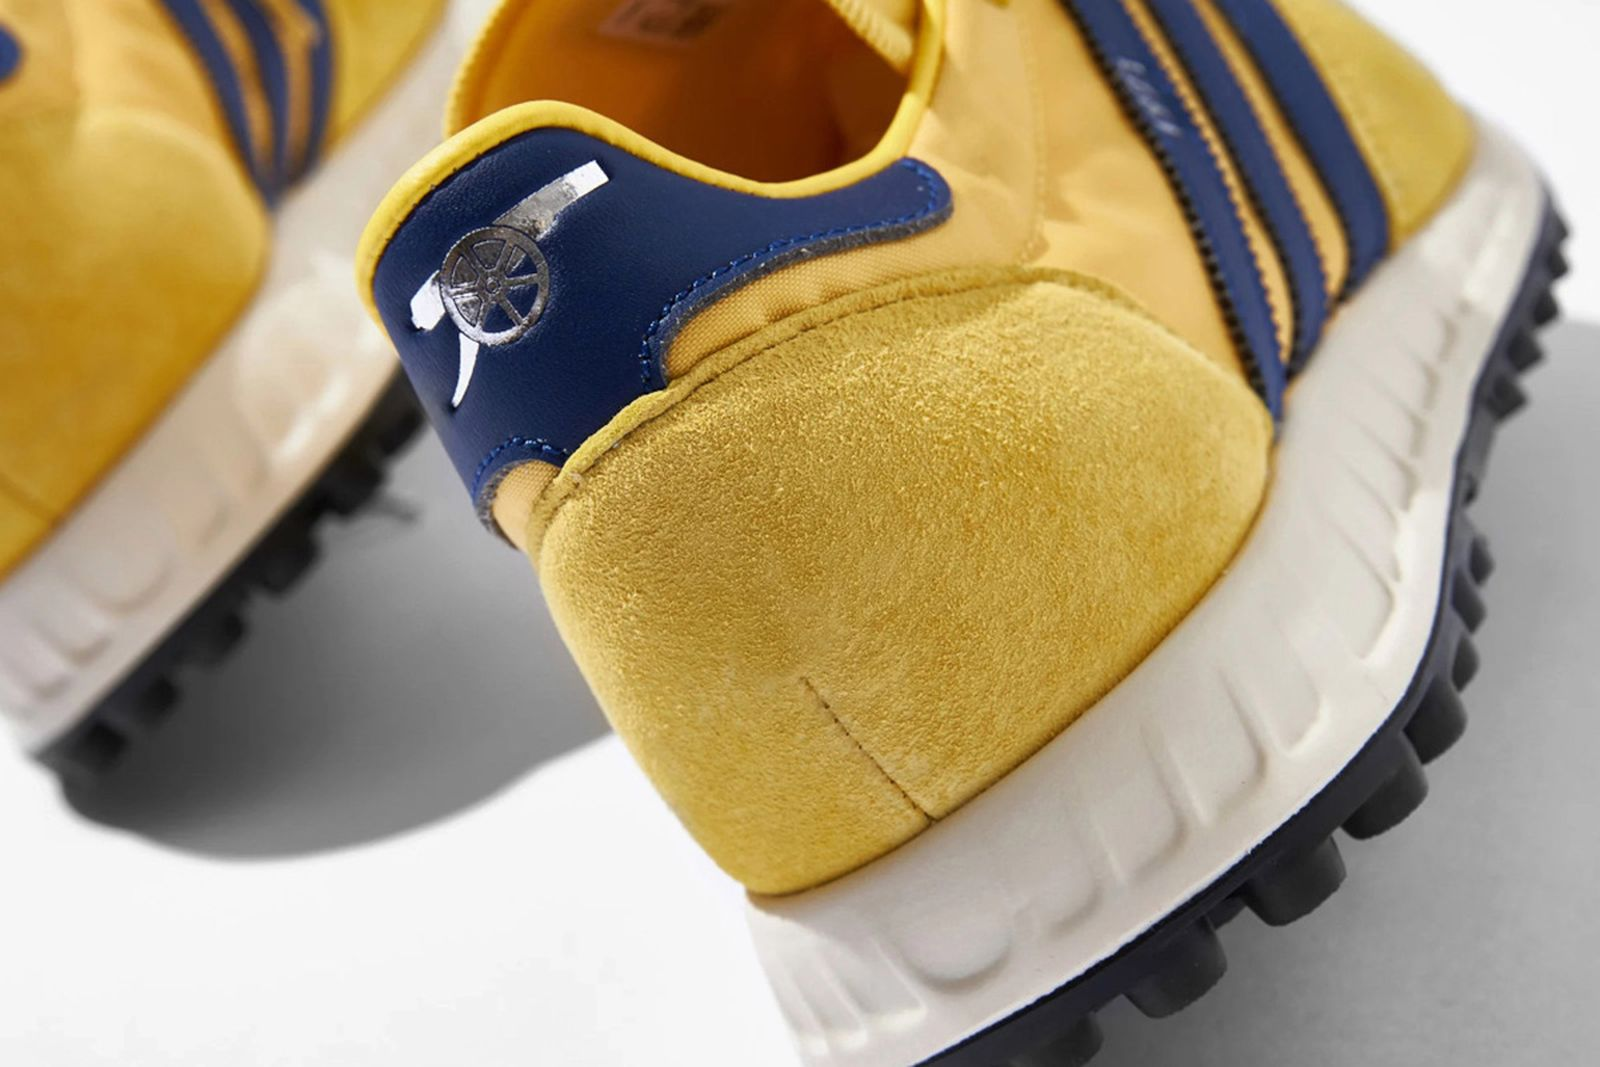 arsenal-adidas-trx-runner-04